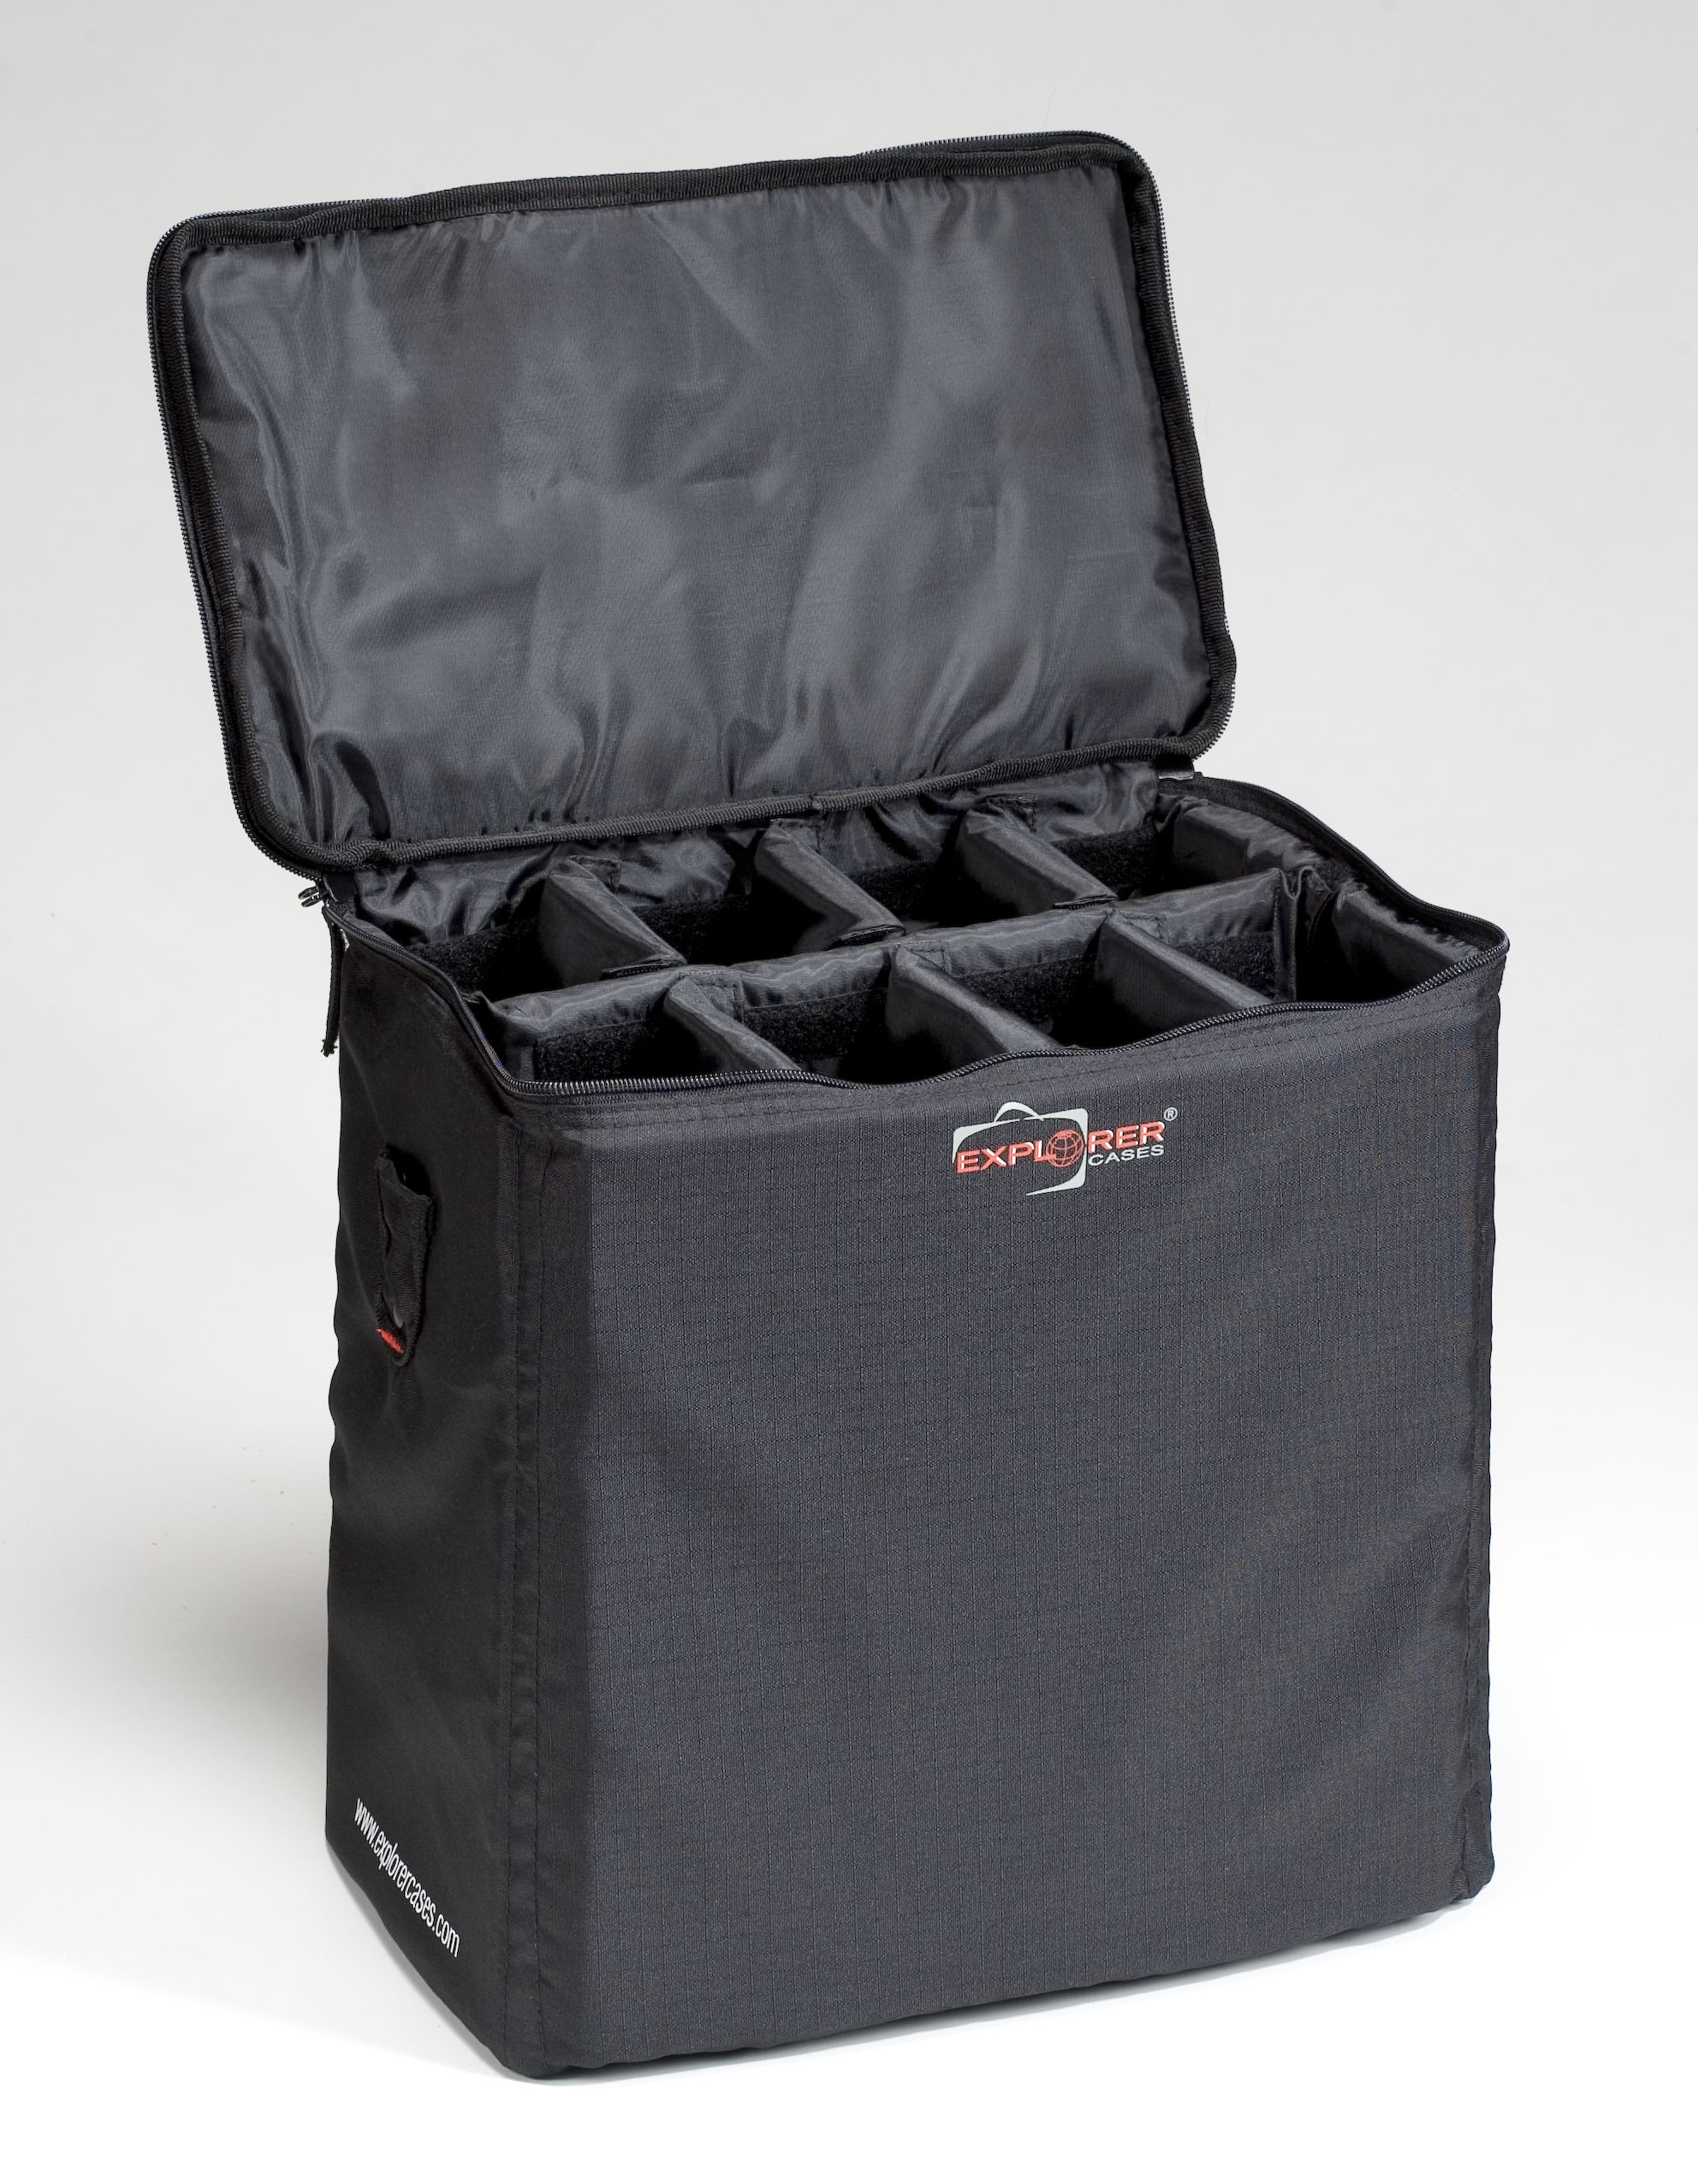 bag o prix ttc explorer cases france gtlbago valise tanche renforc e et caisse en aluminium. Black Bedroom Furniture Sets. Home Design Ideas